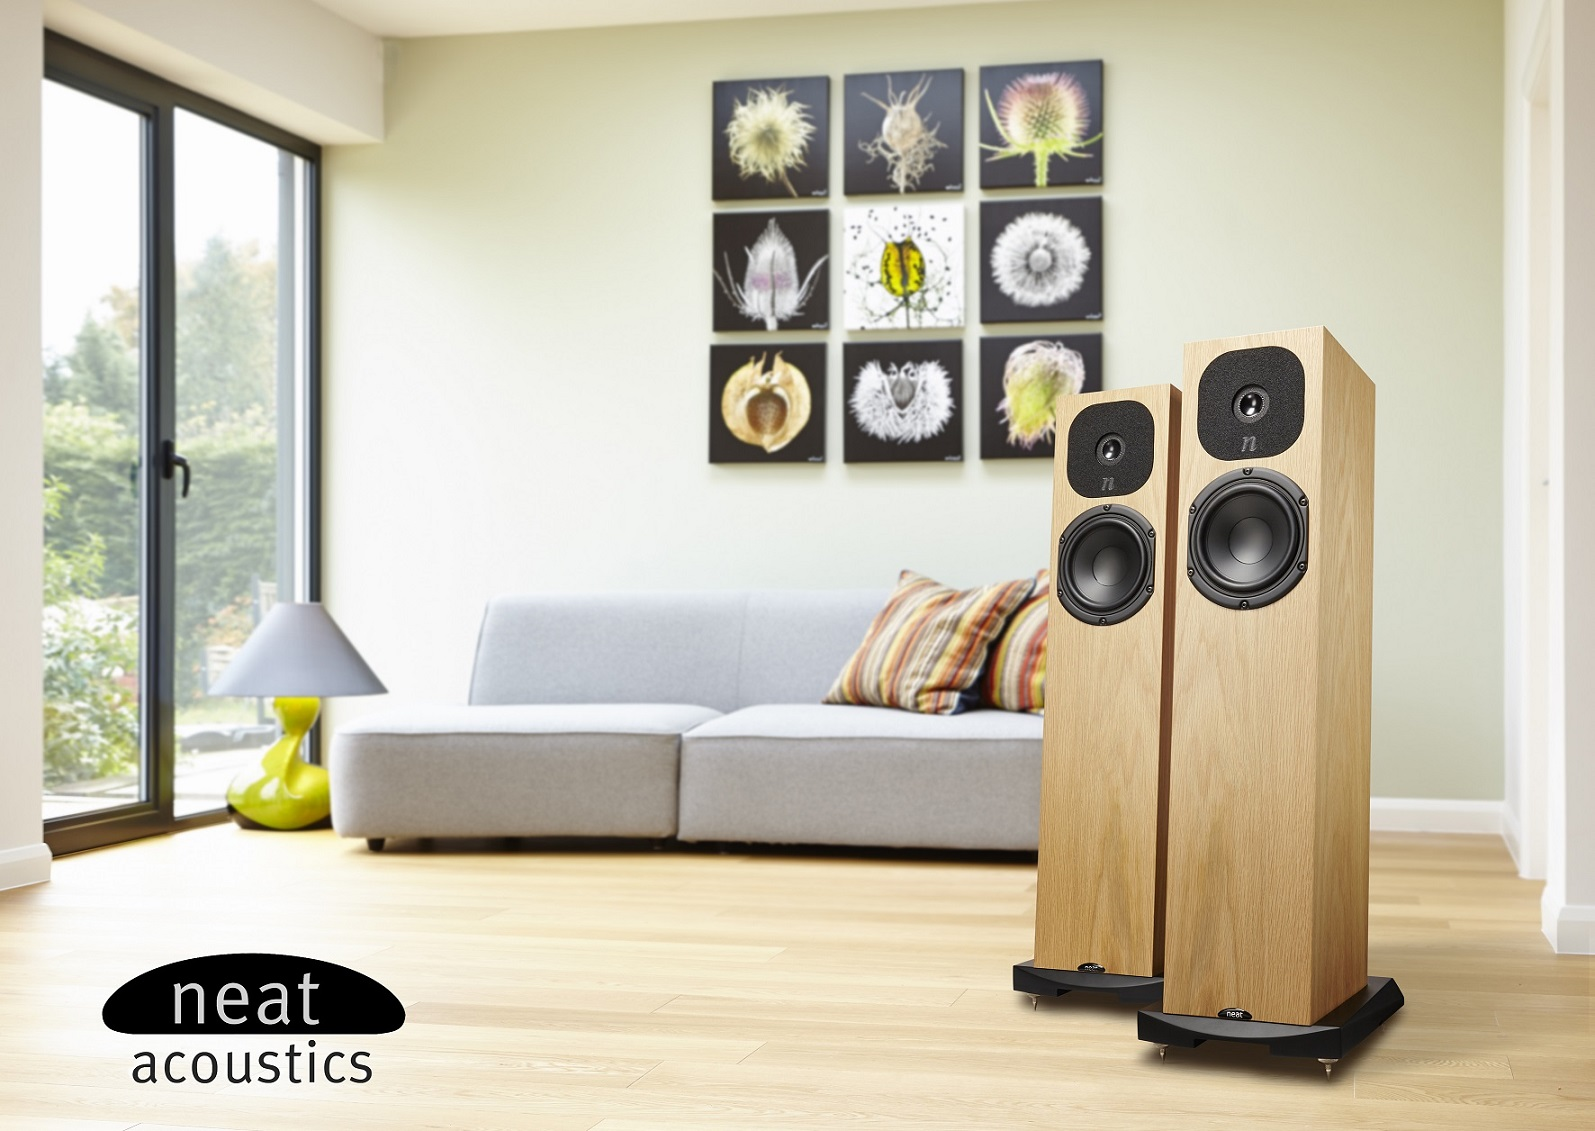 NEAT Acoustics - Lautsprecher made in UK